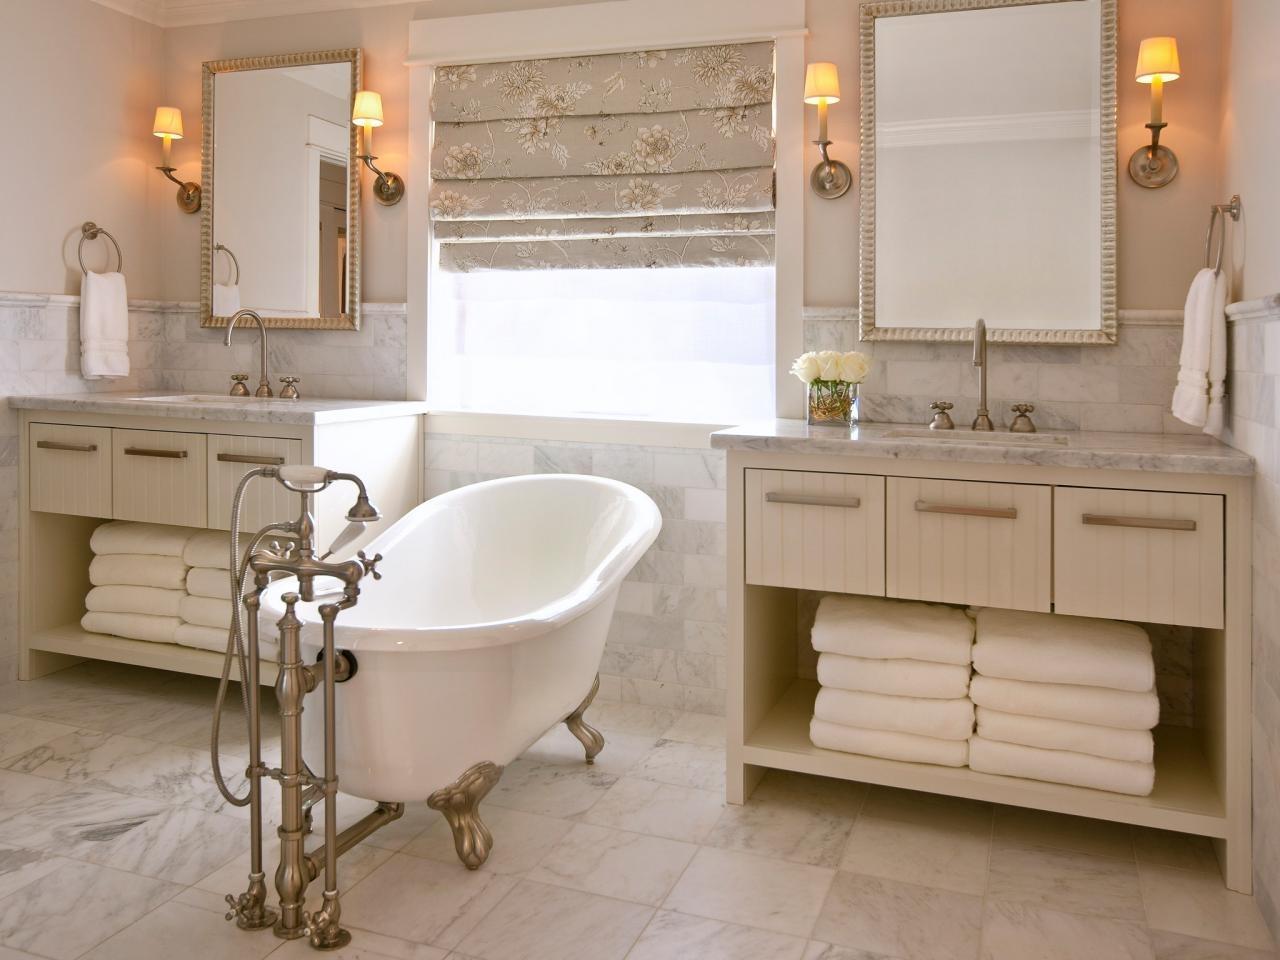 10 Stylish Master Bedroom And Bathroom Ideas %name 2021